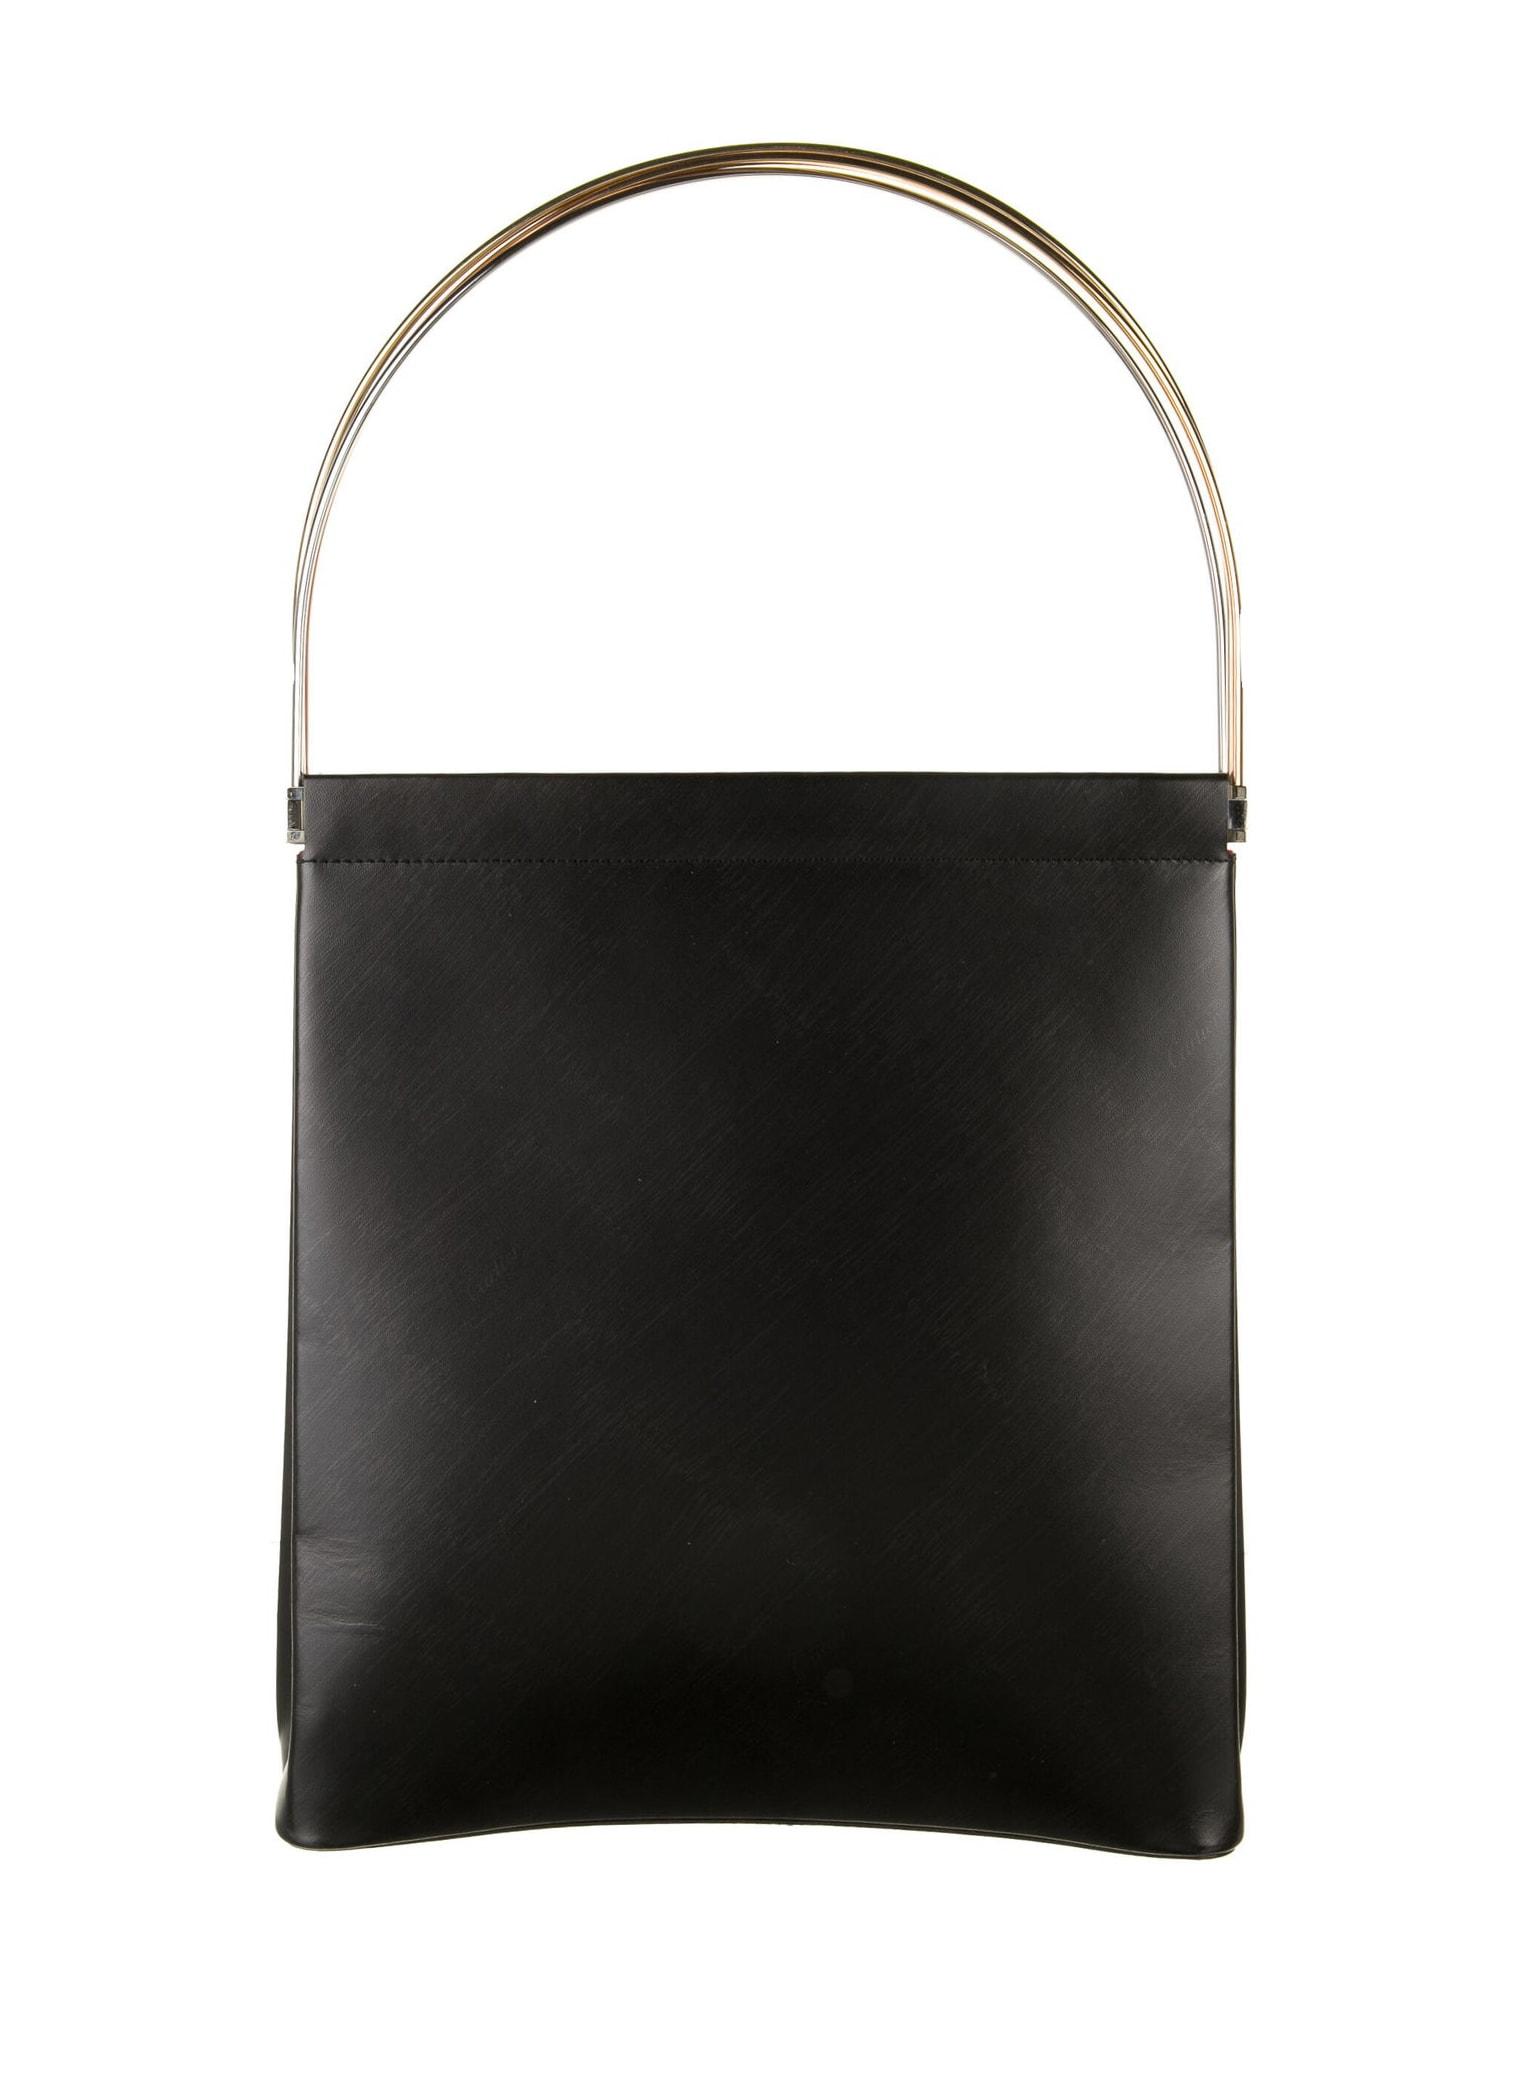 CARTIER Trinity Cage Bag